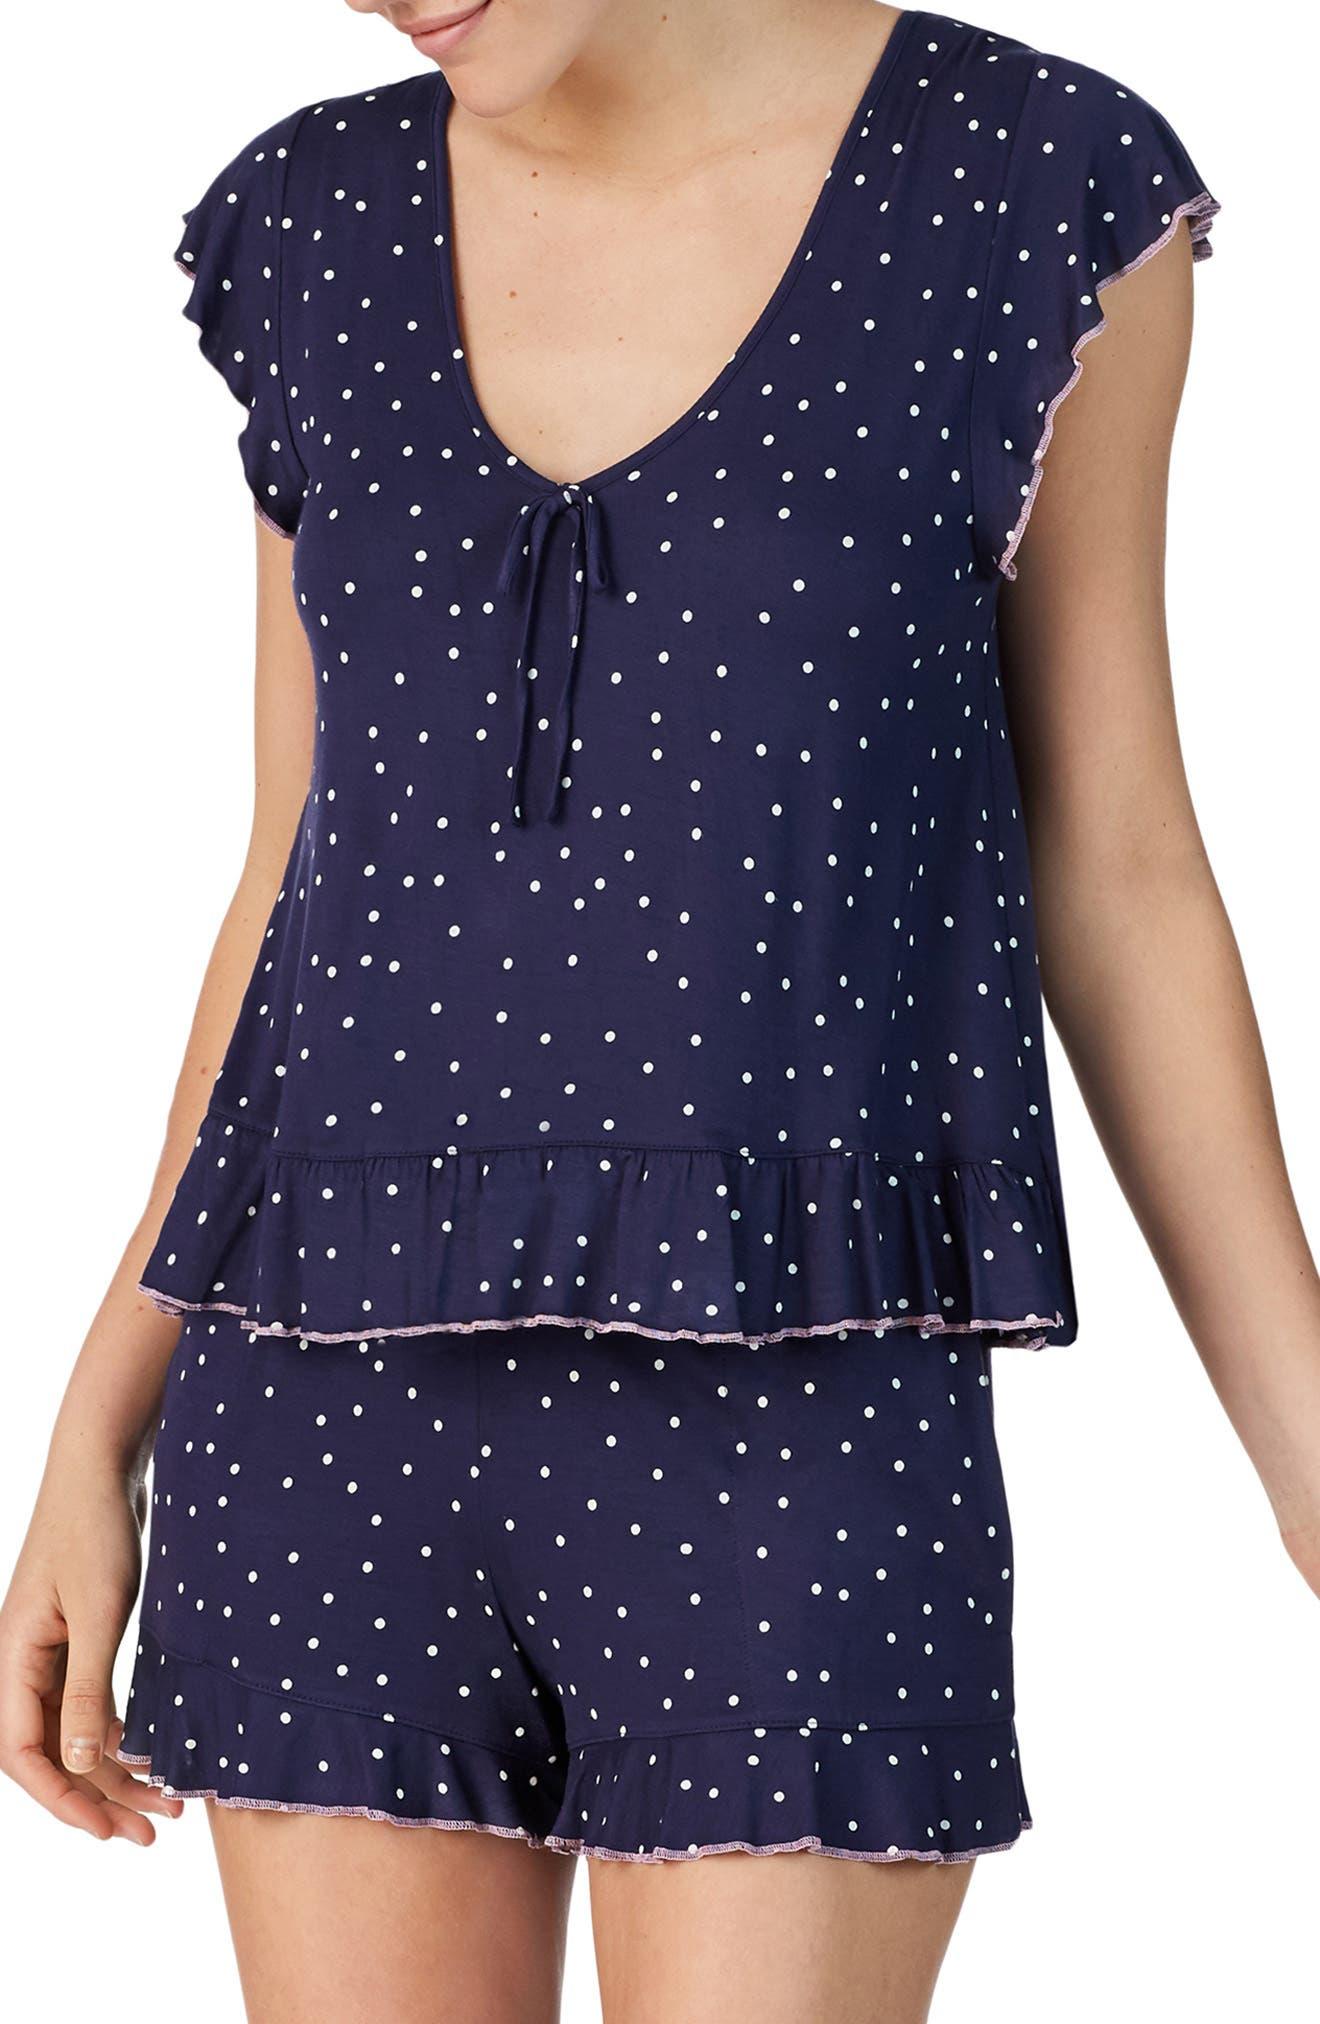 Room Service Ruffle Short Pajamas, Blue (Nordstrom Exclusive)